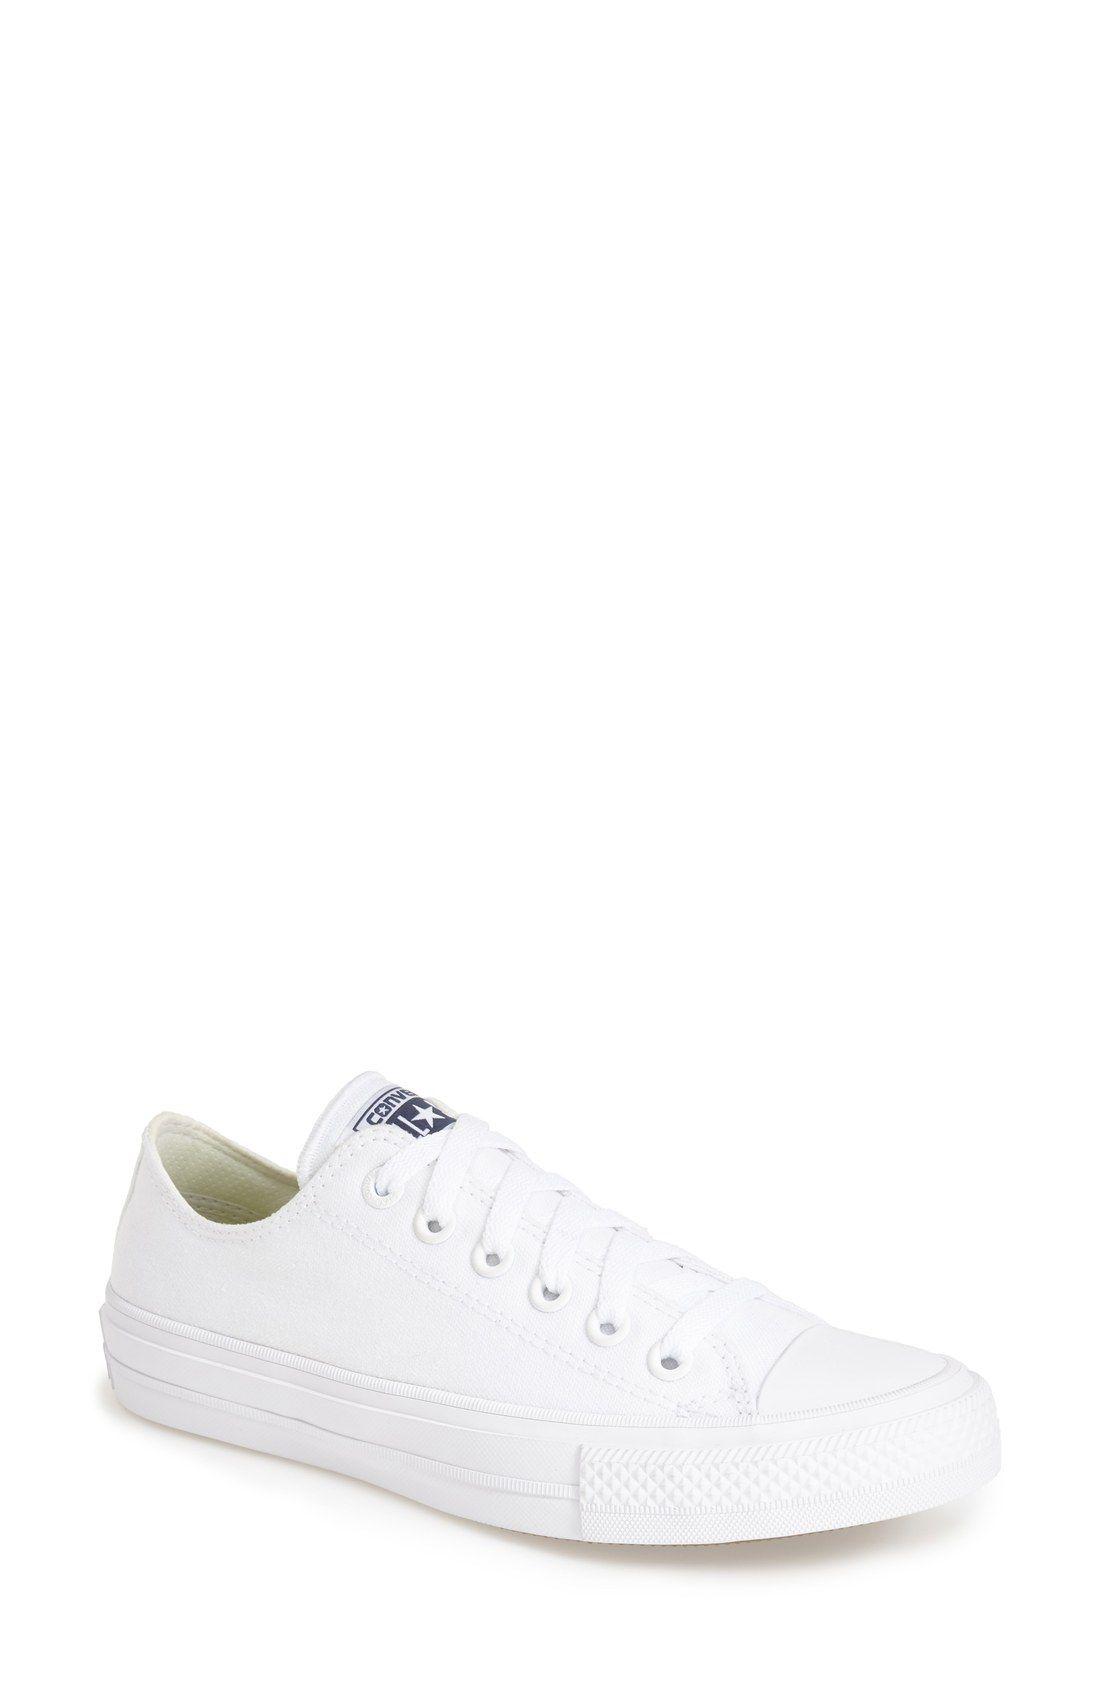 Converse Chuck Taylor® All Star®  Chuck II  Low Top Sneaker (Women ... 1aab3c87f7